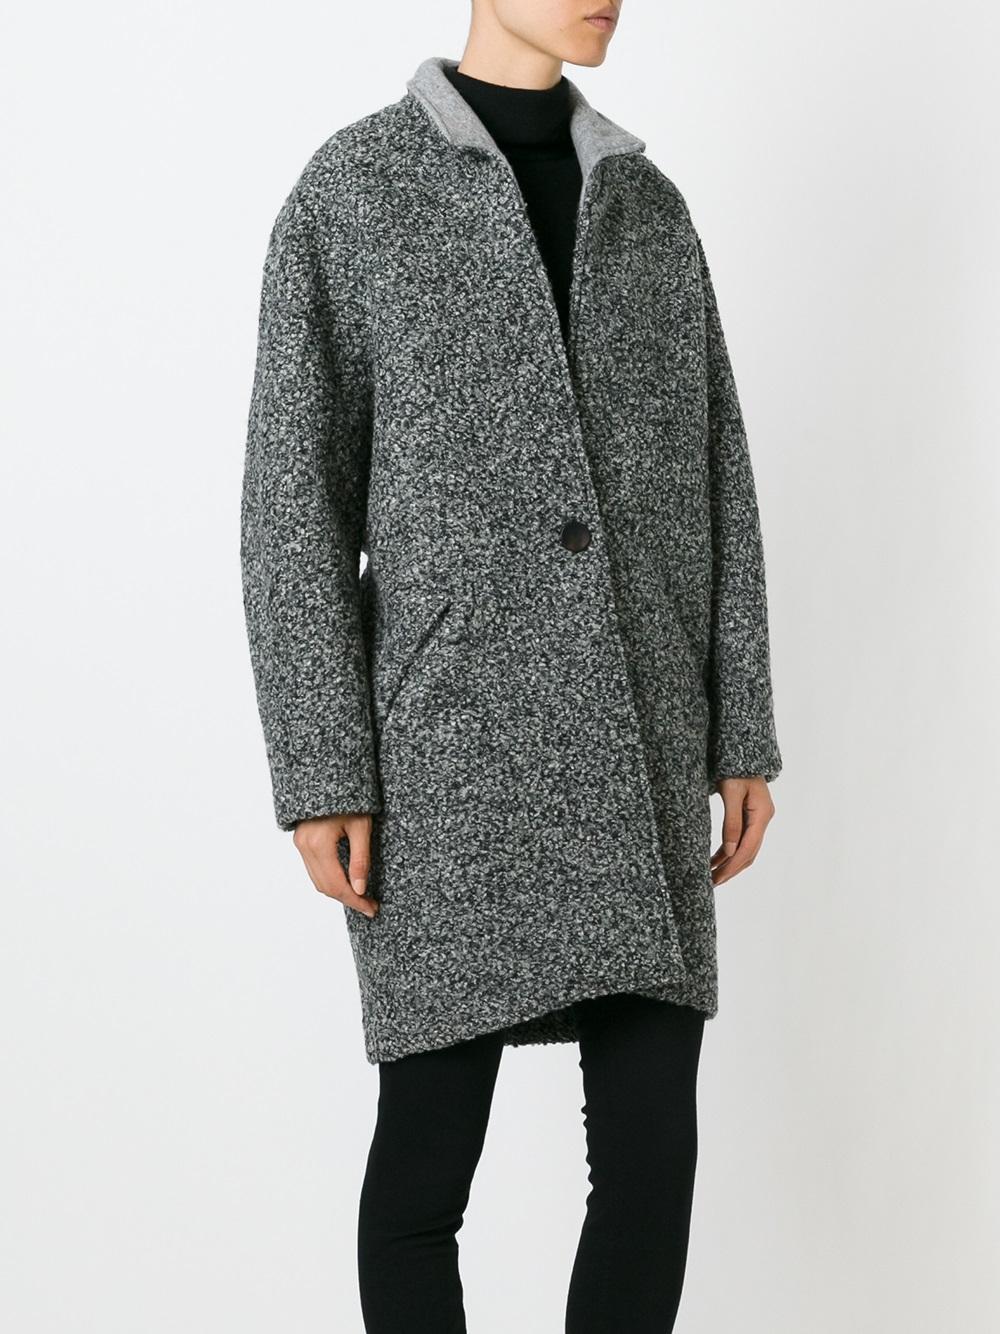 Isabel marant Daryl Neoprene Coat in Gray | Lyst